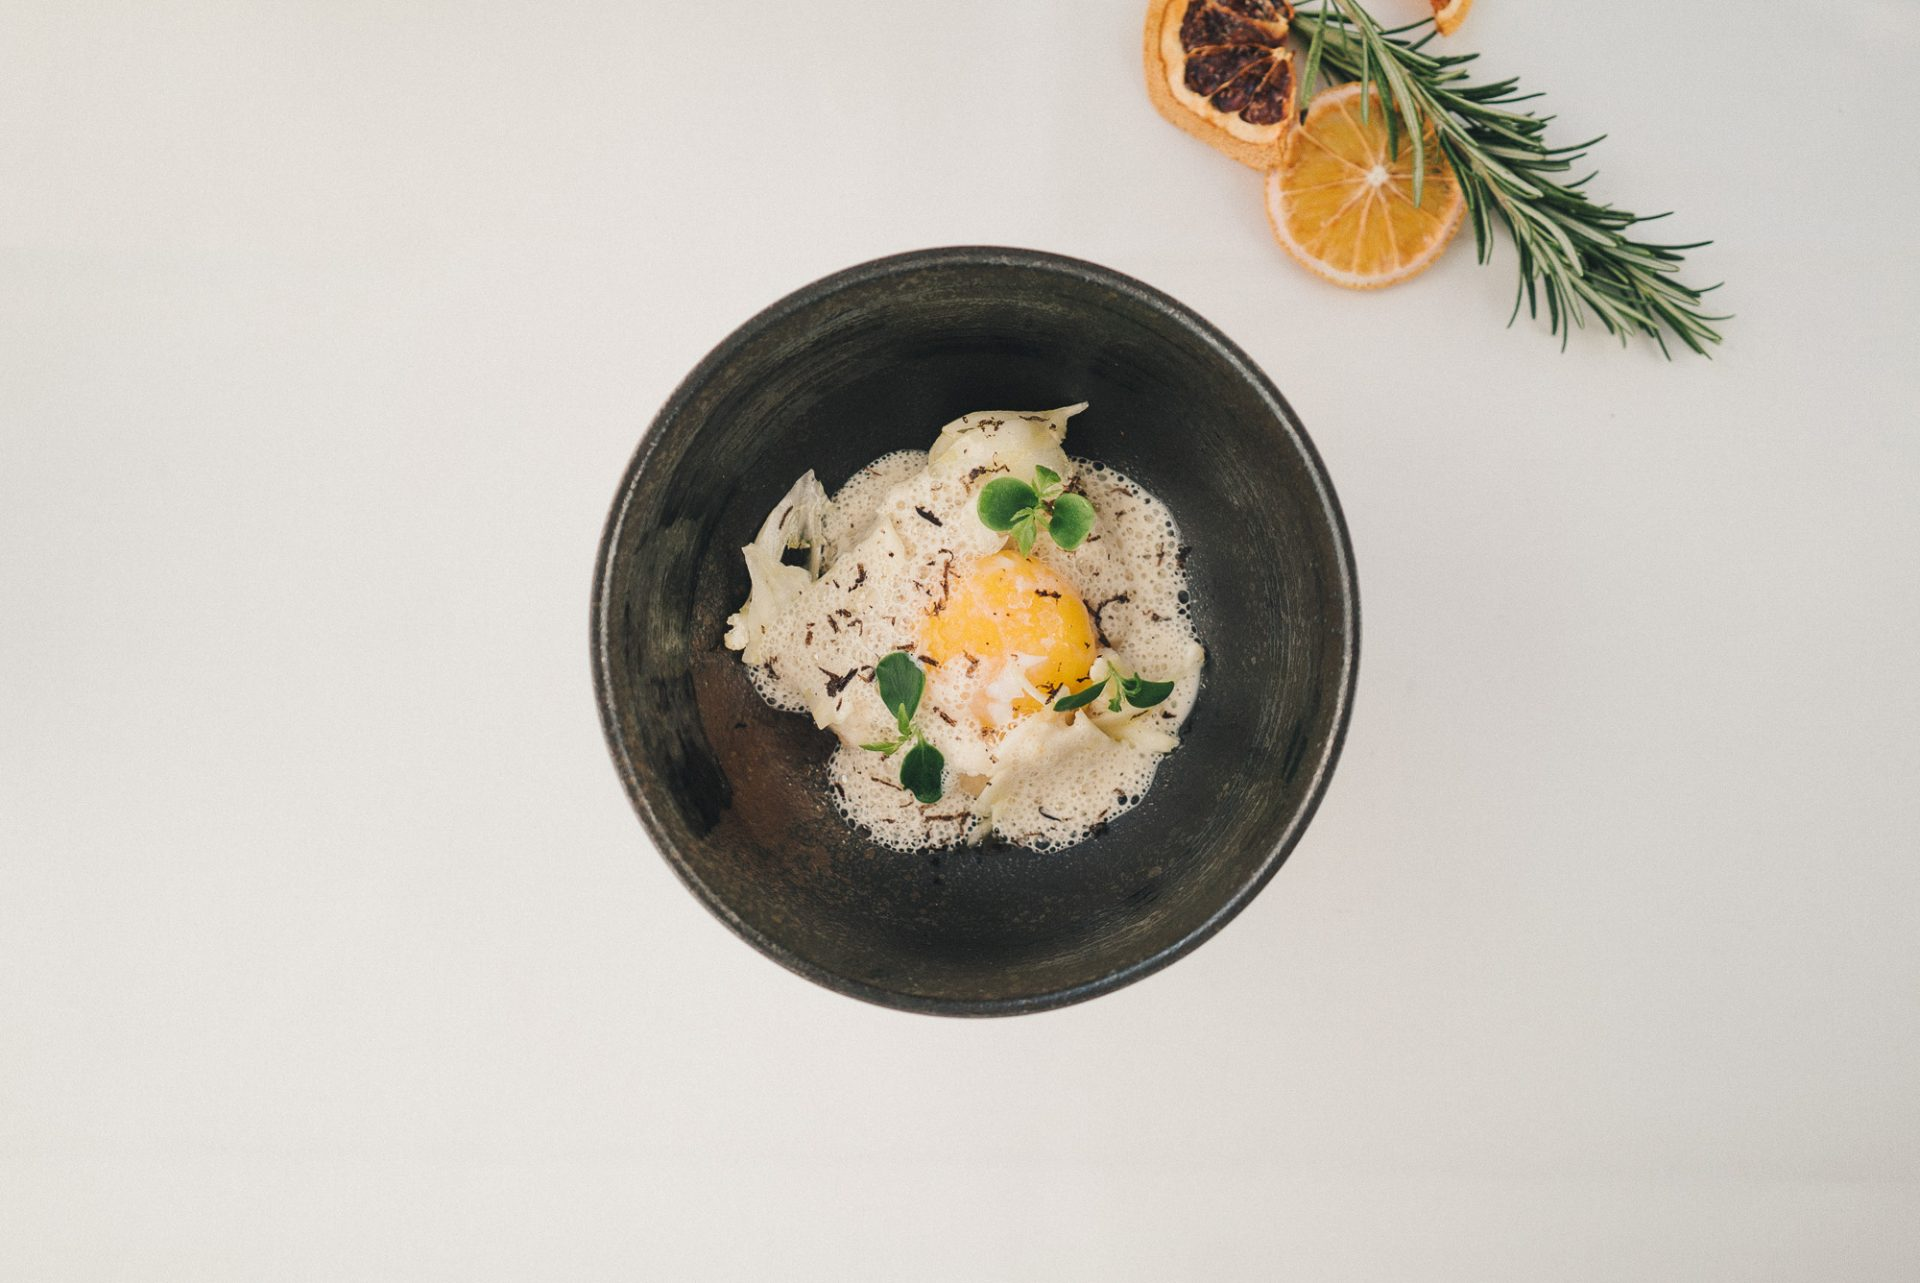 Culinary Foodfotograf für Sterneküche © Offenblende / Dimi